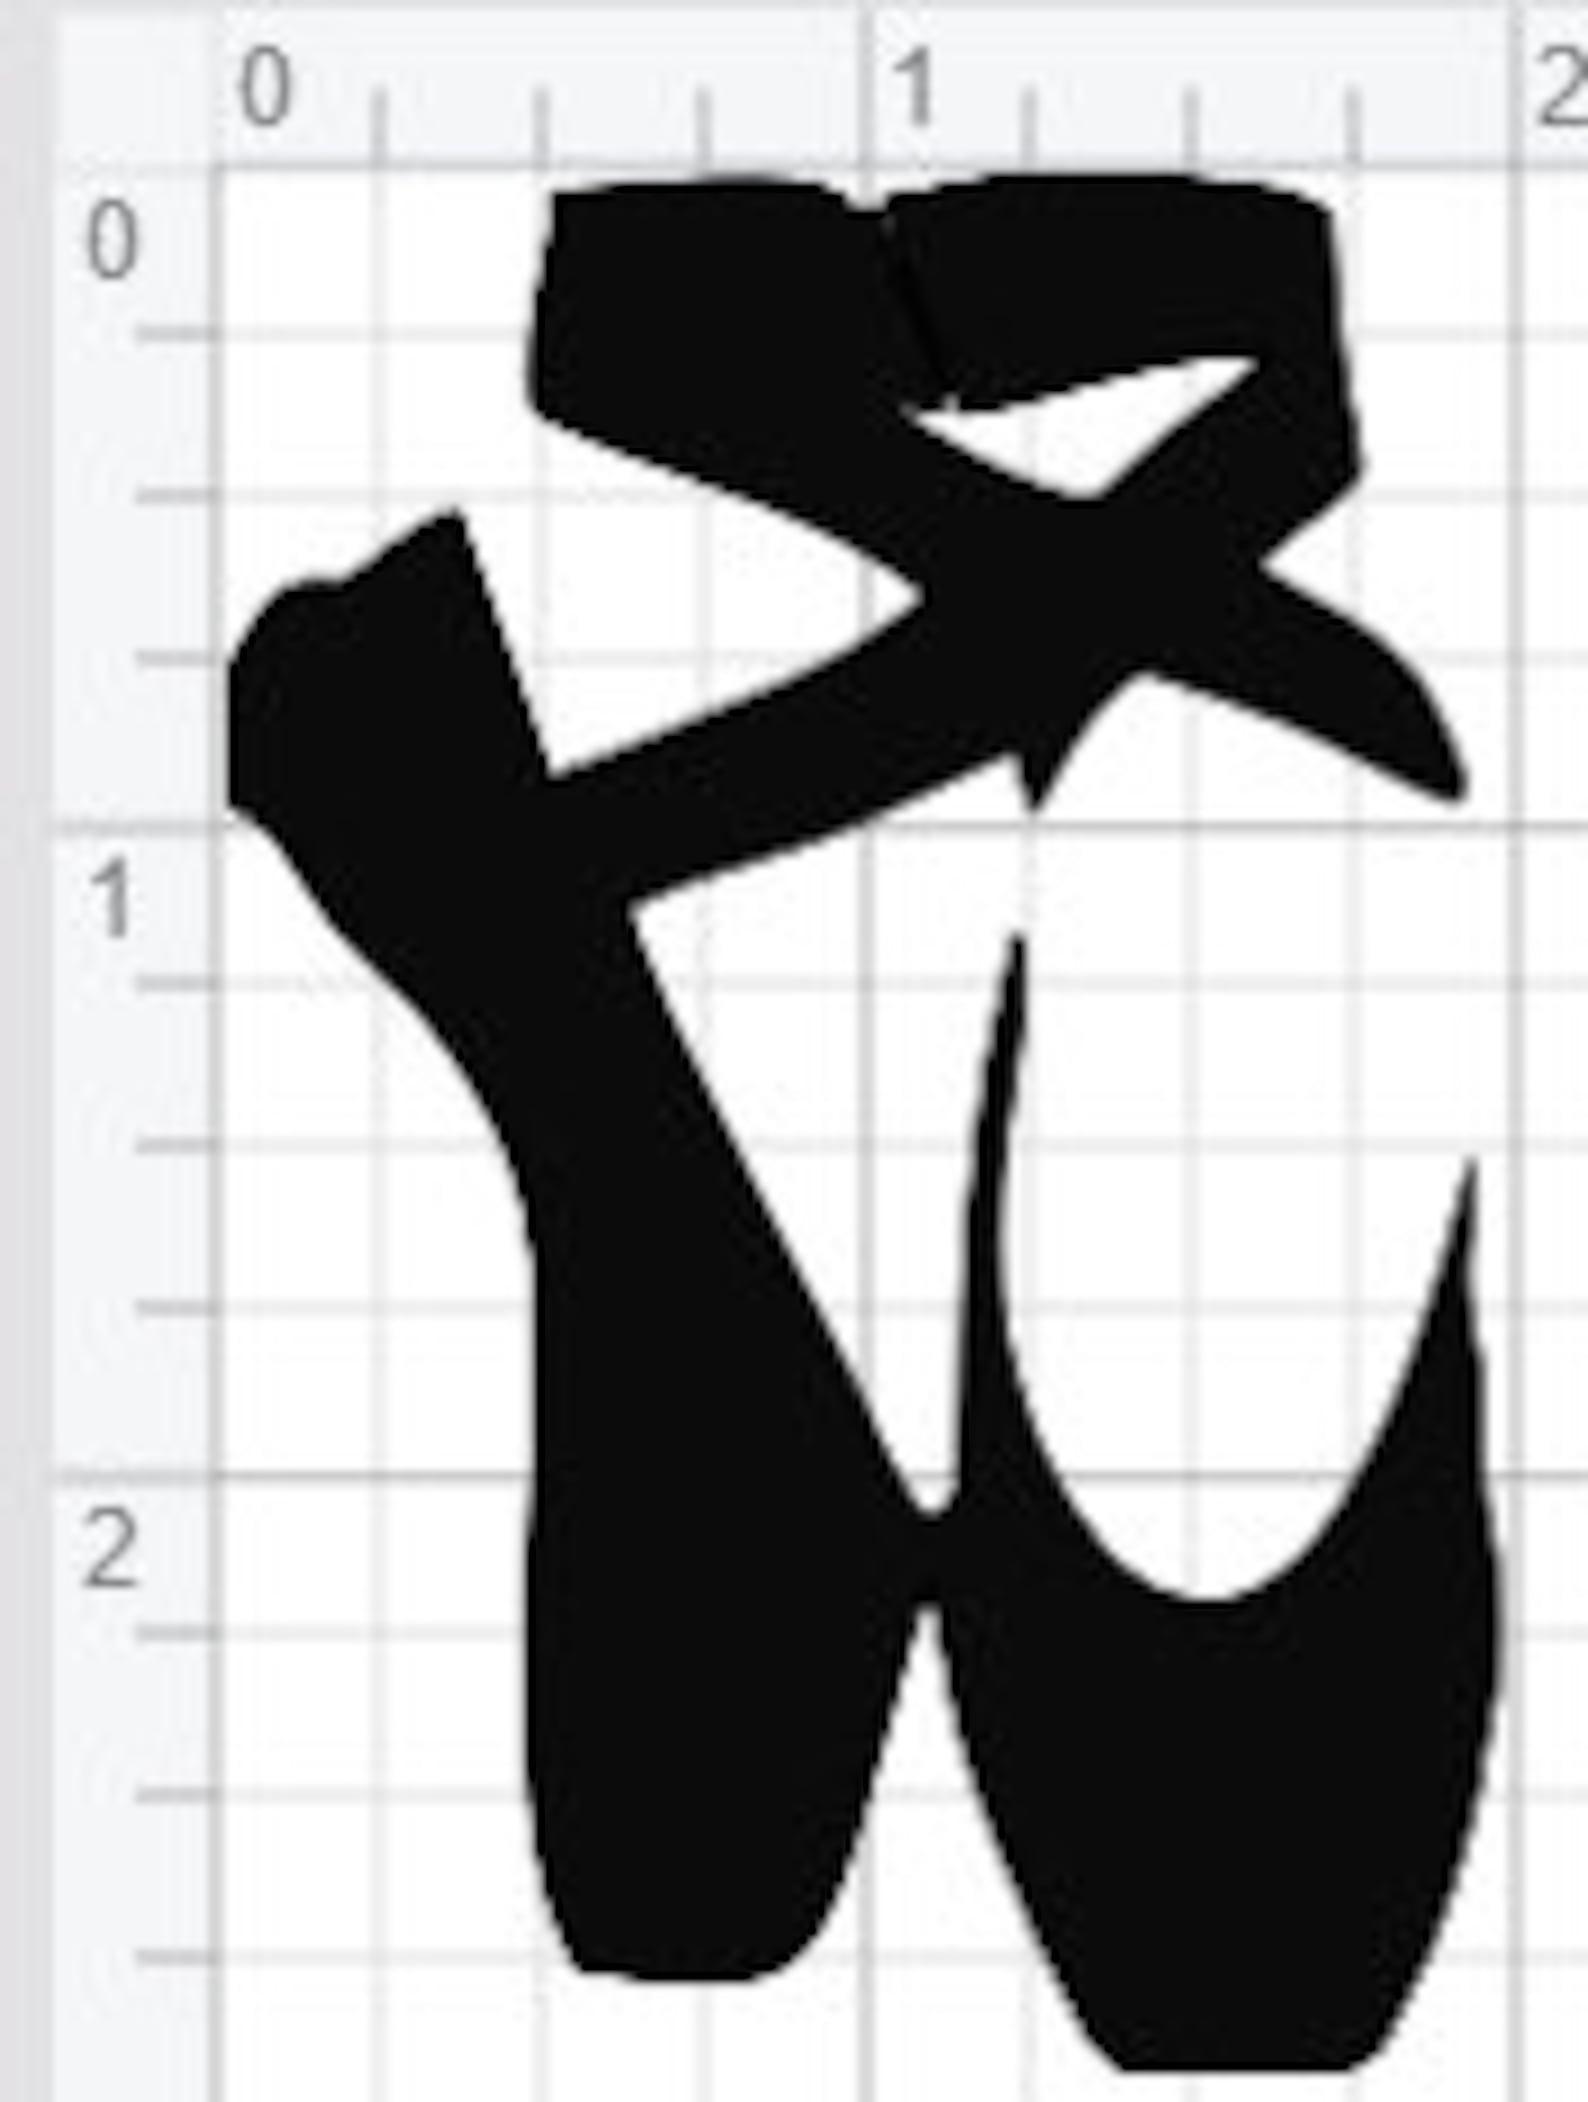 ballet pointe slippers design svg eps dxf pdf studio 3 cut files